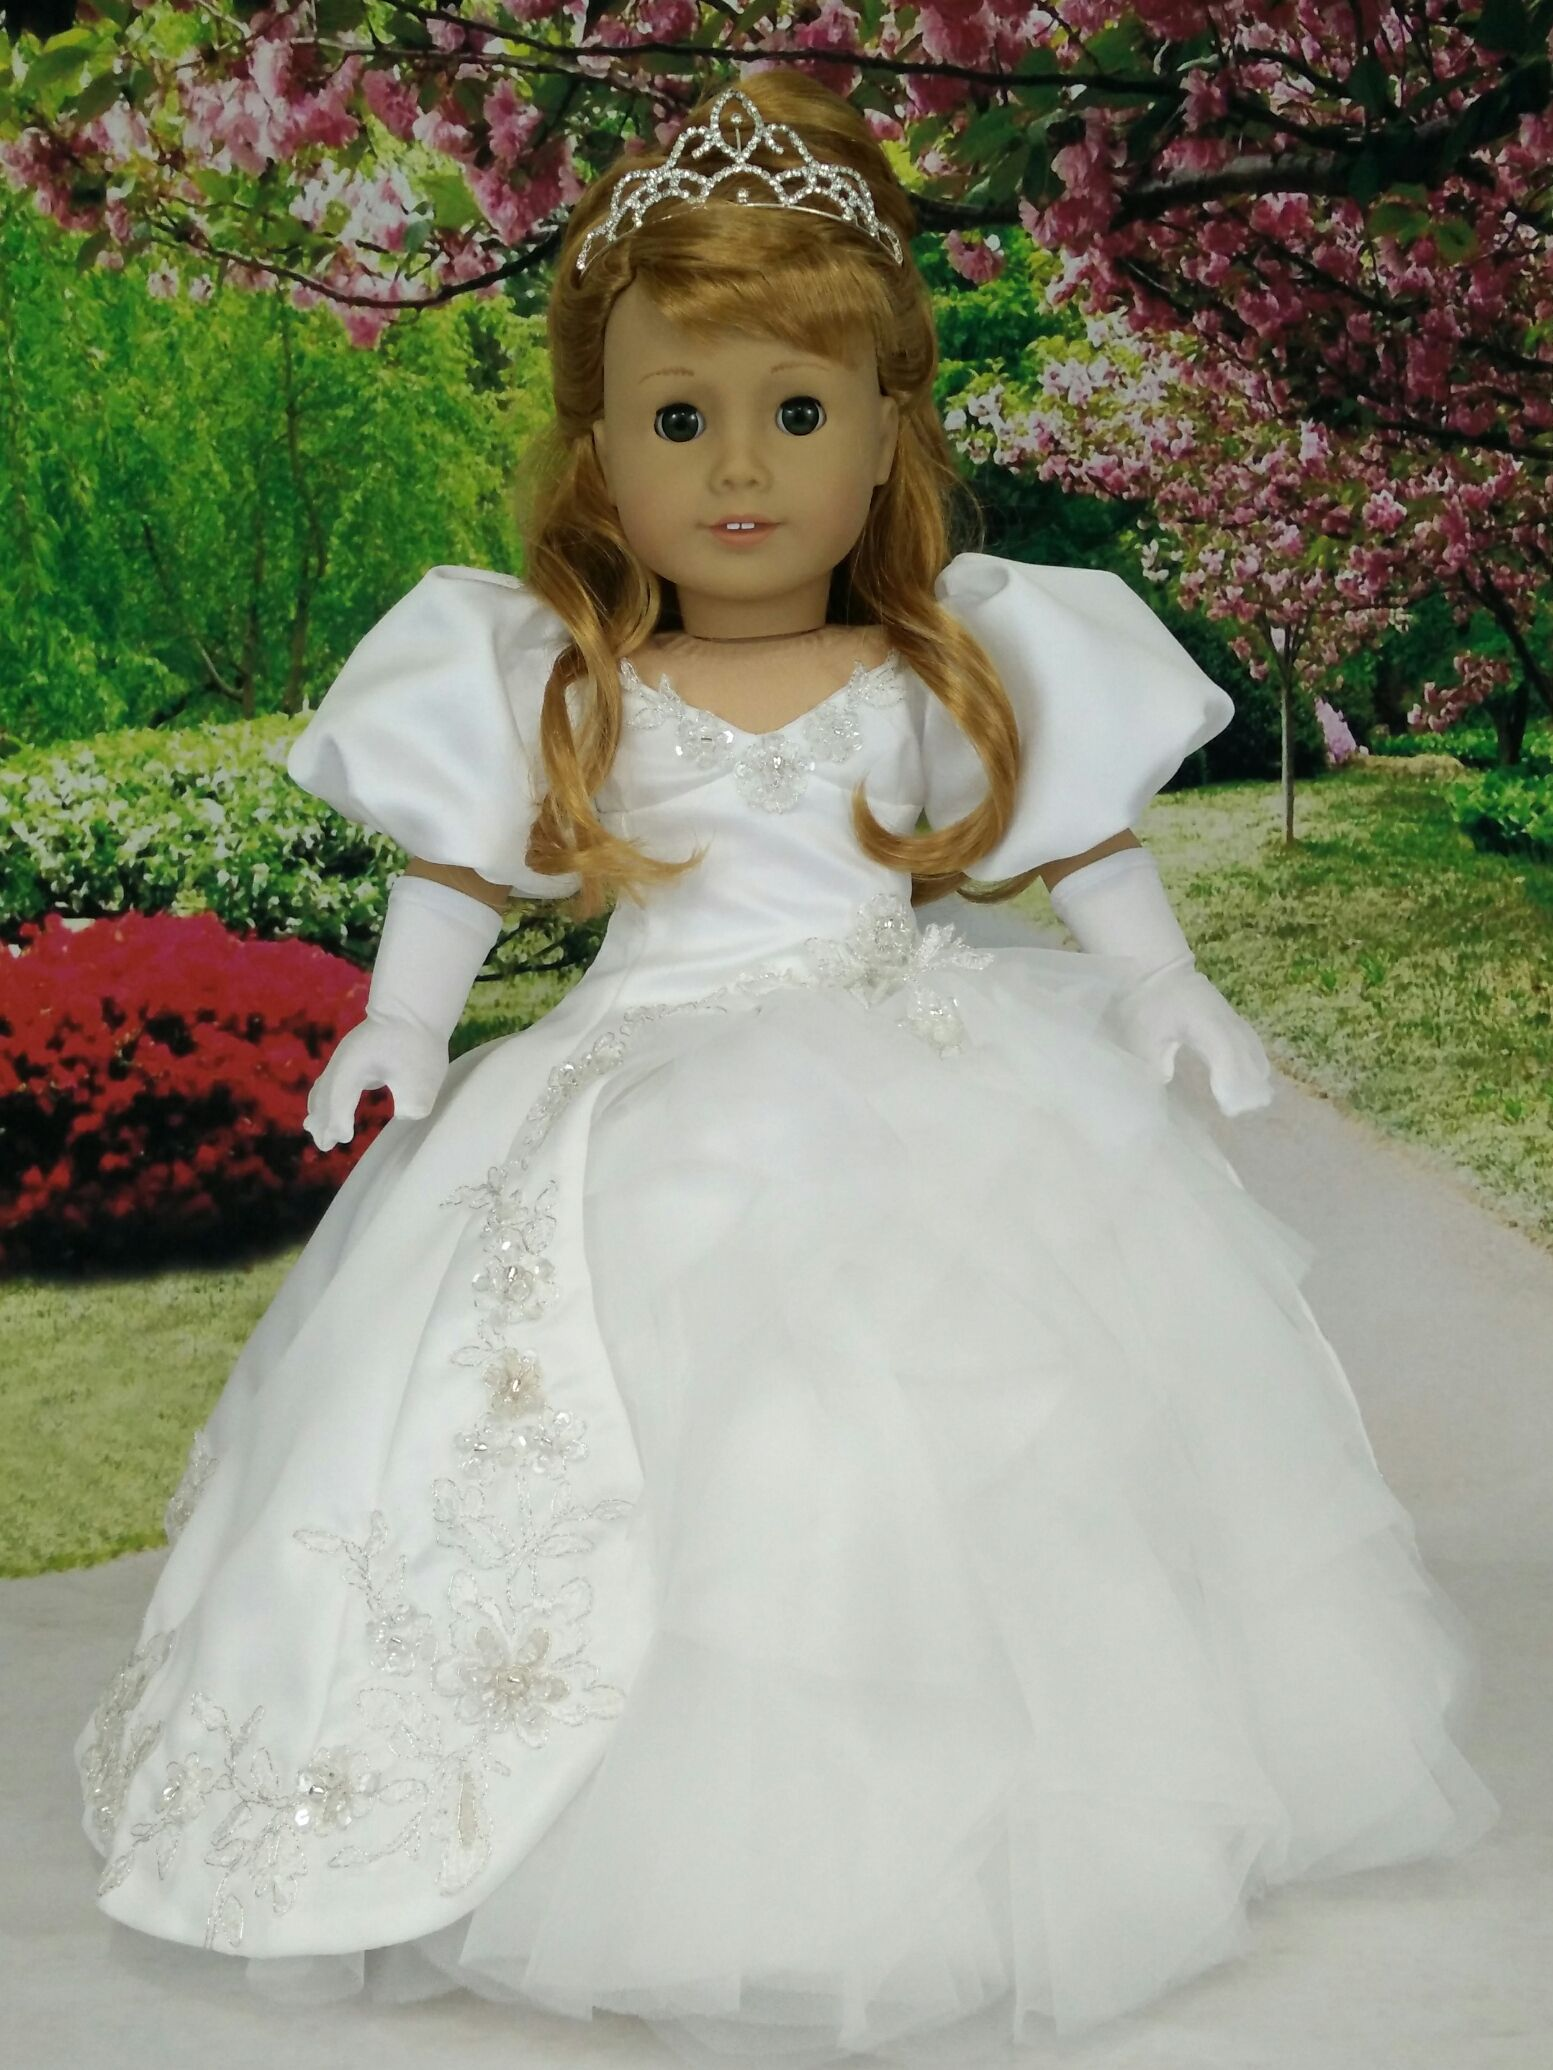 American Girl Doll Maryellen as Enchanted Princess Giselle